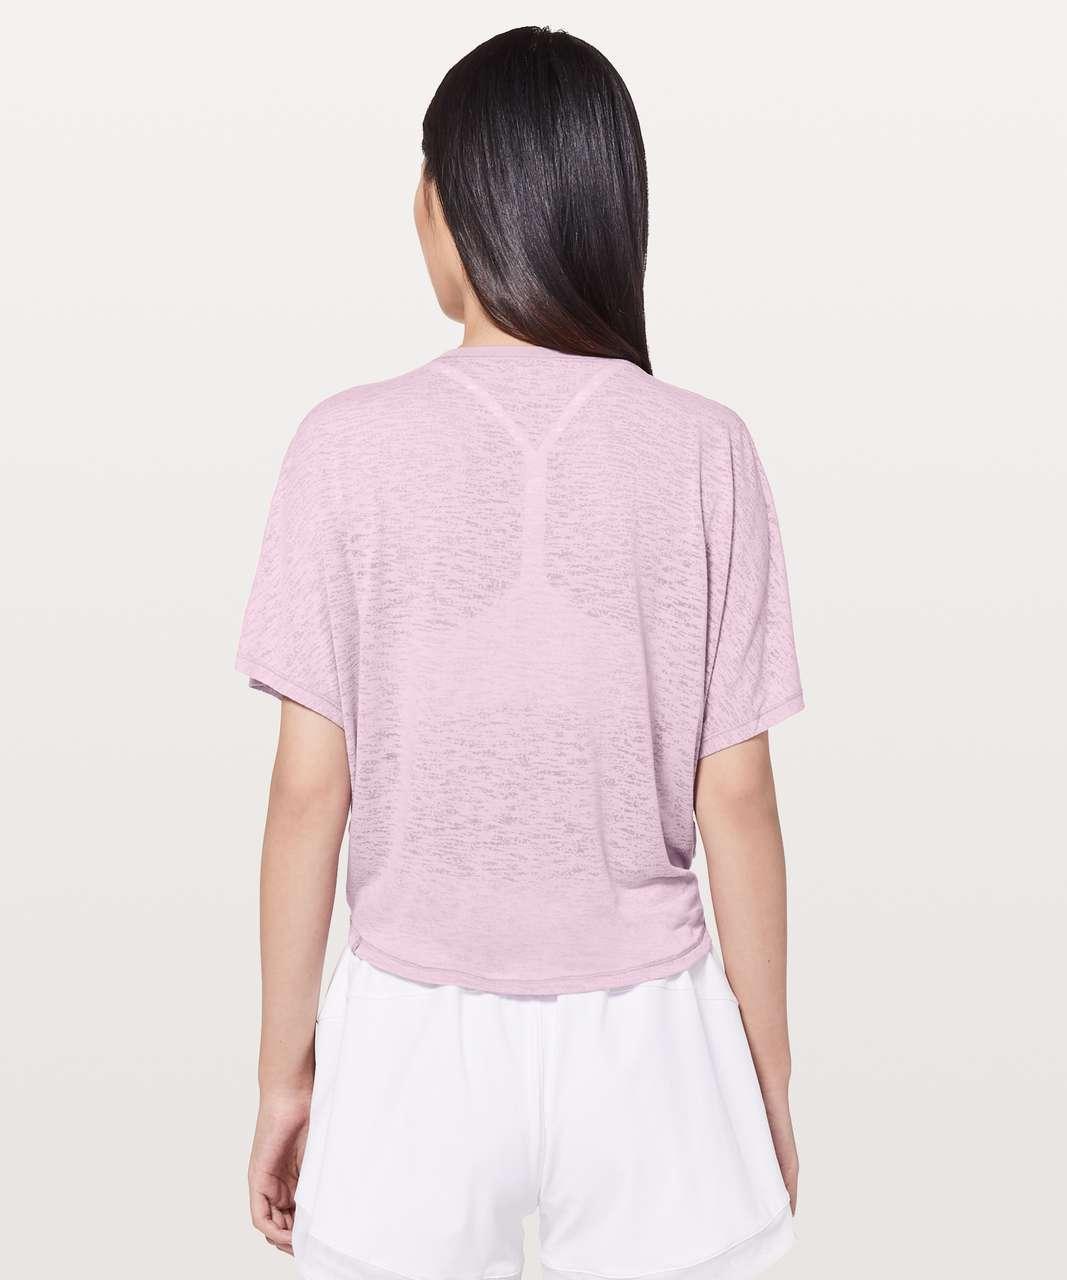 Lululemon In Sequence Short Sleeve - Rose Blush